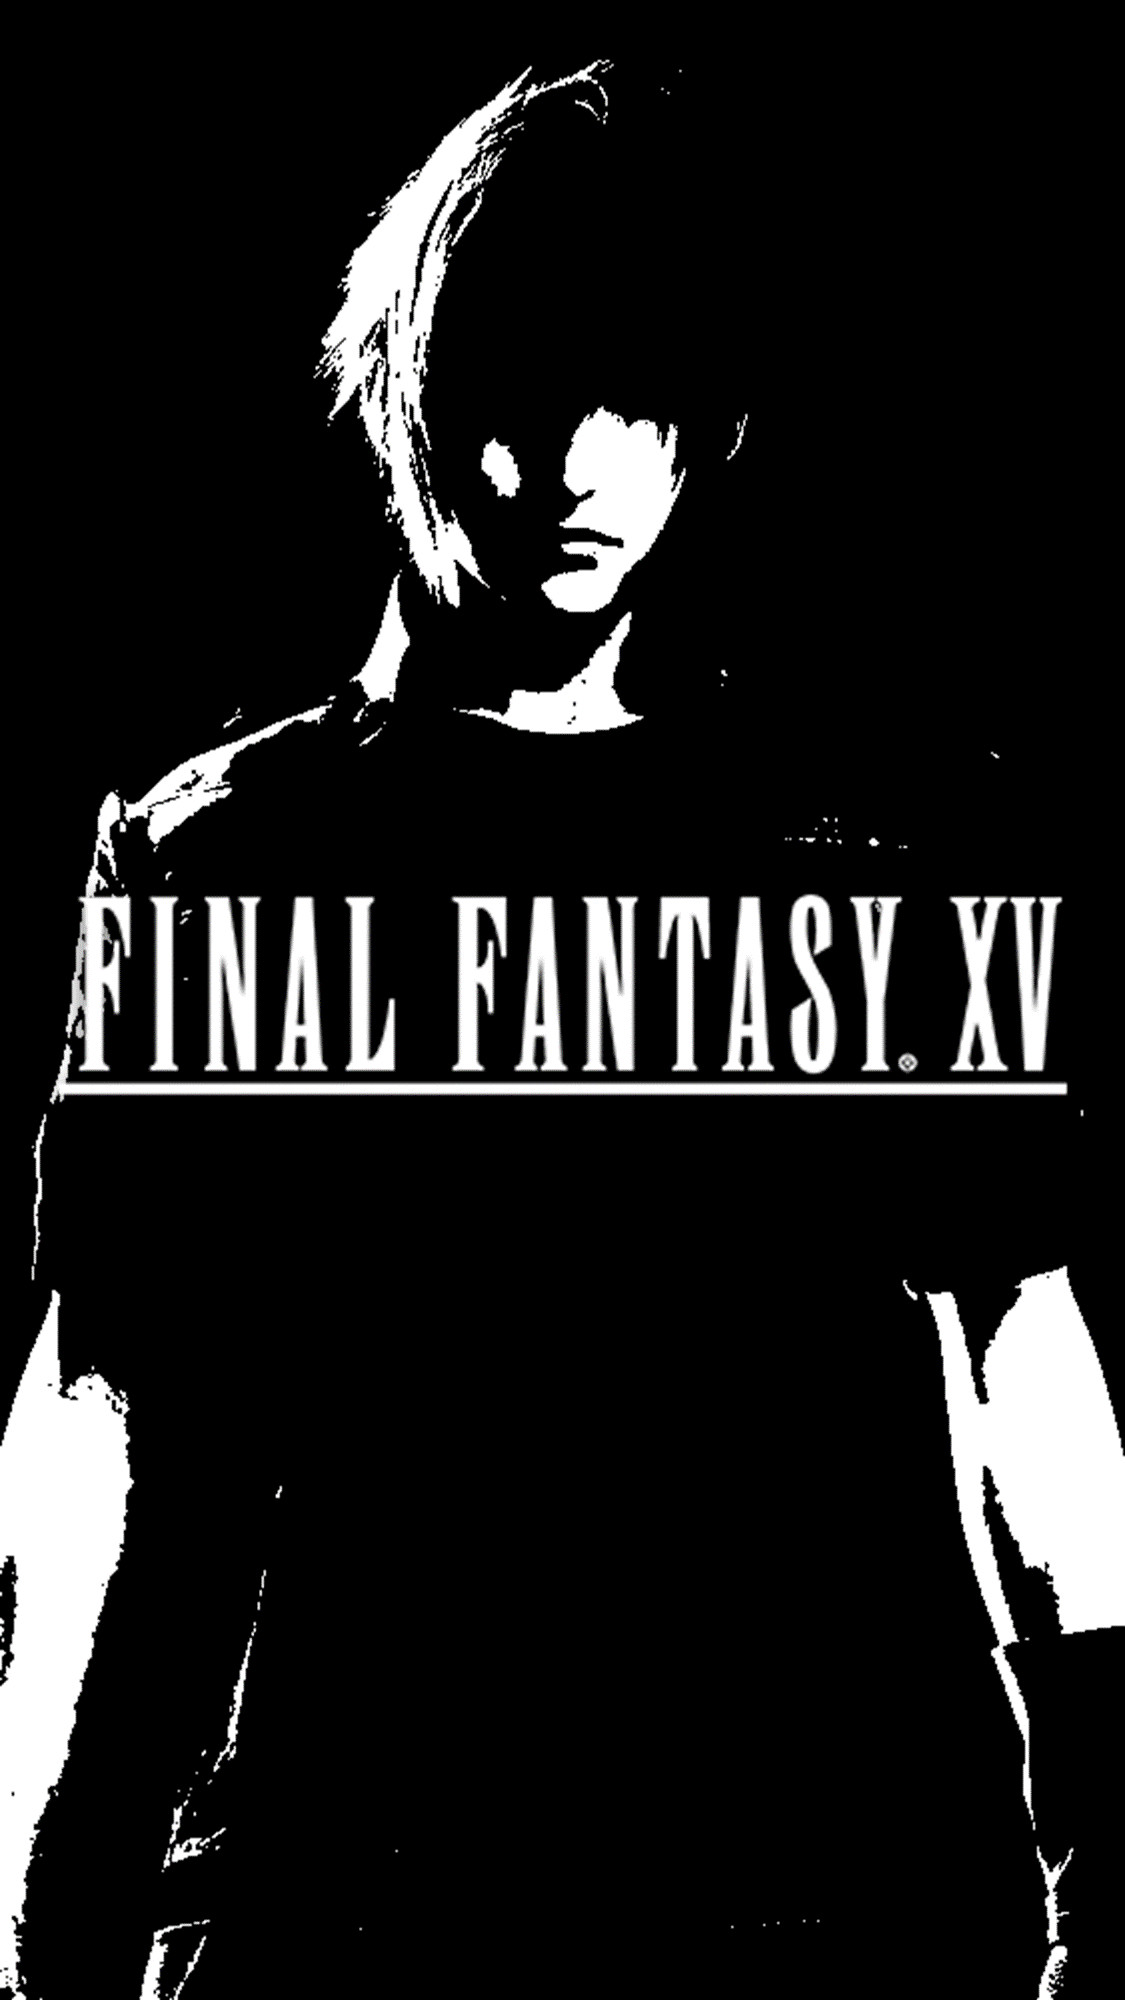 … Final Fantasy XV Wallpaper Mobile by Hokage455